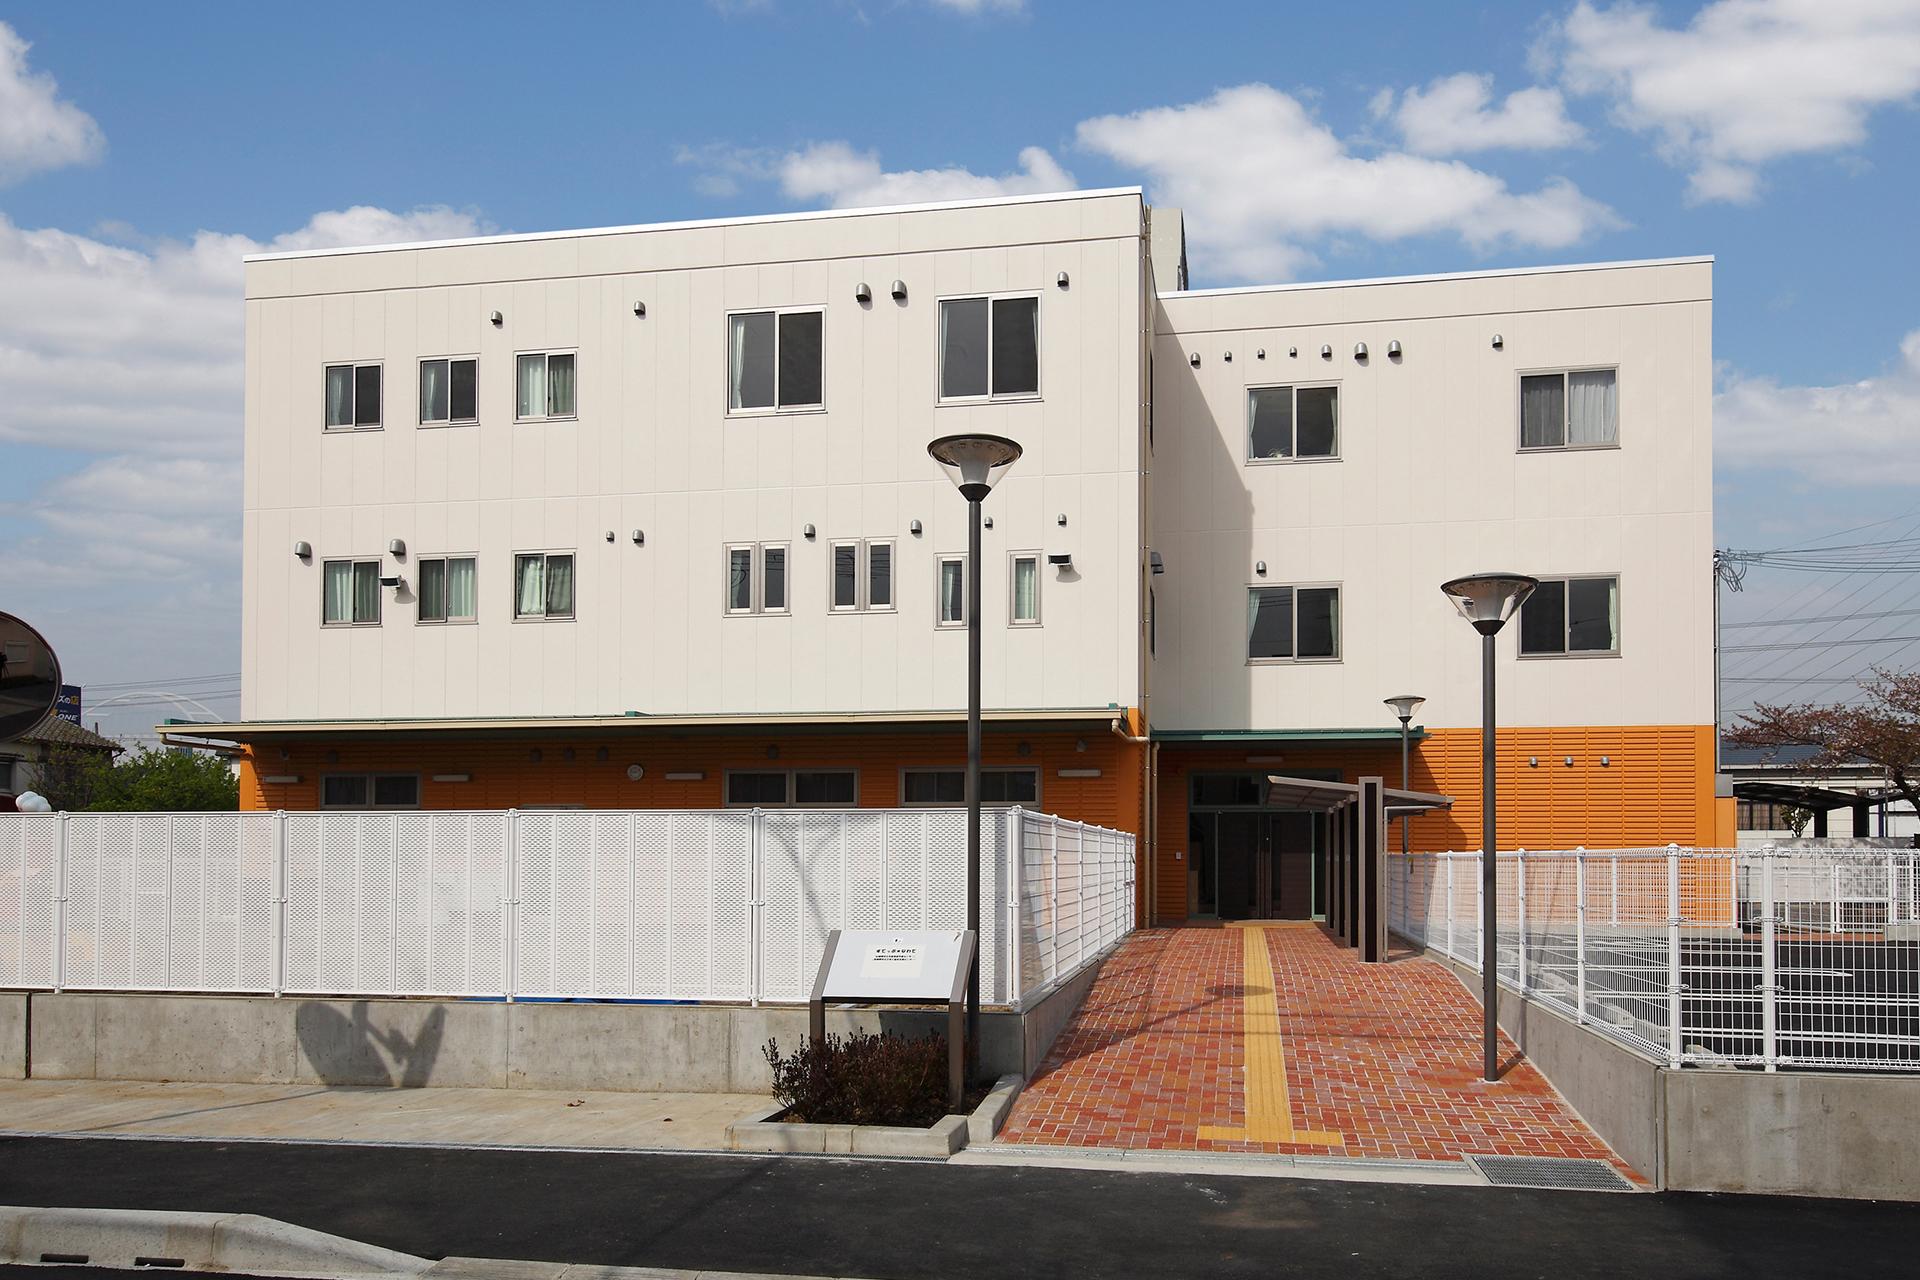 市立児童発達支援センター等新築工事